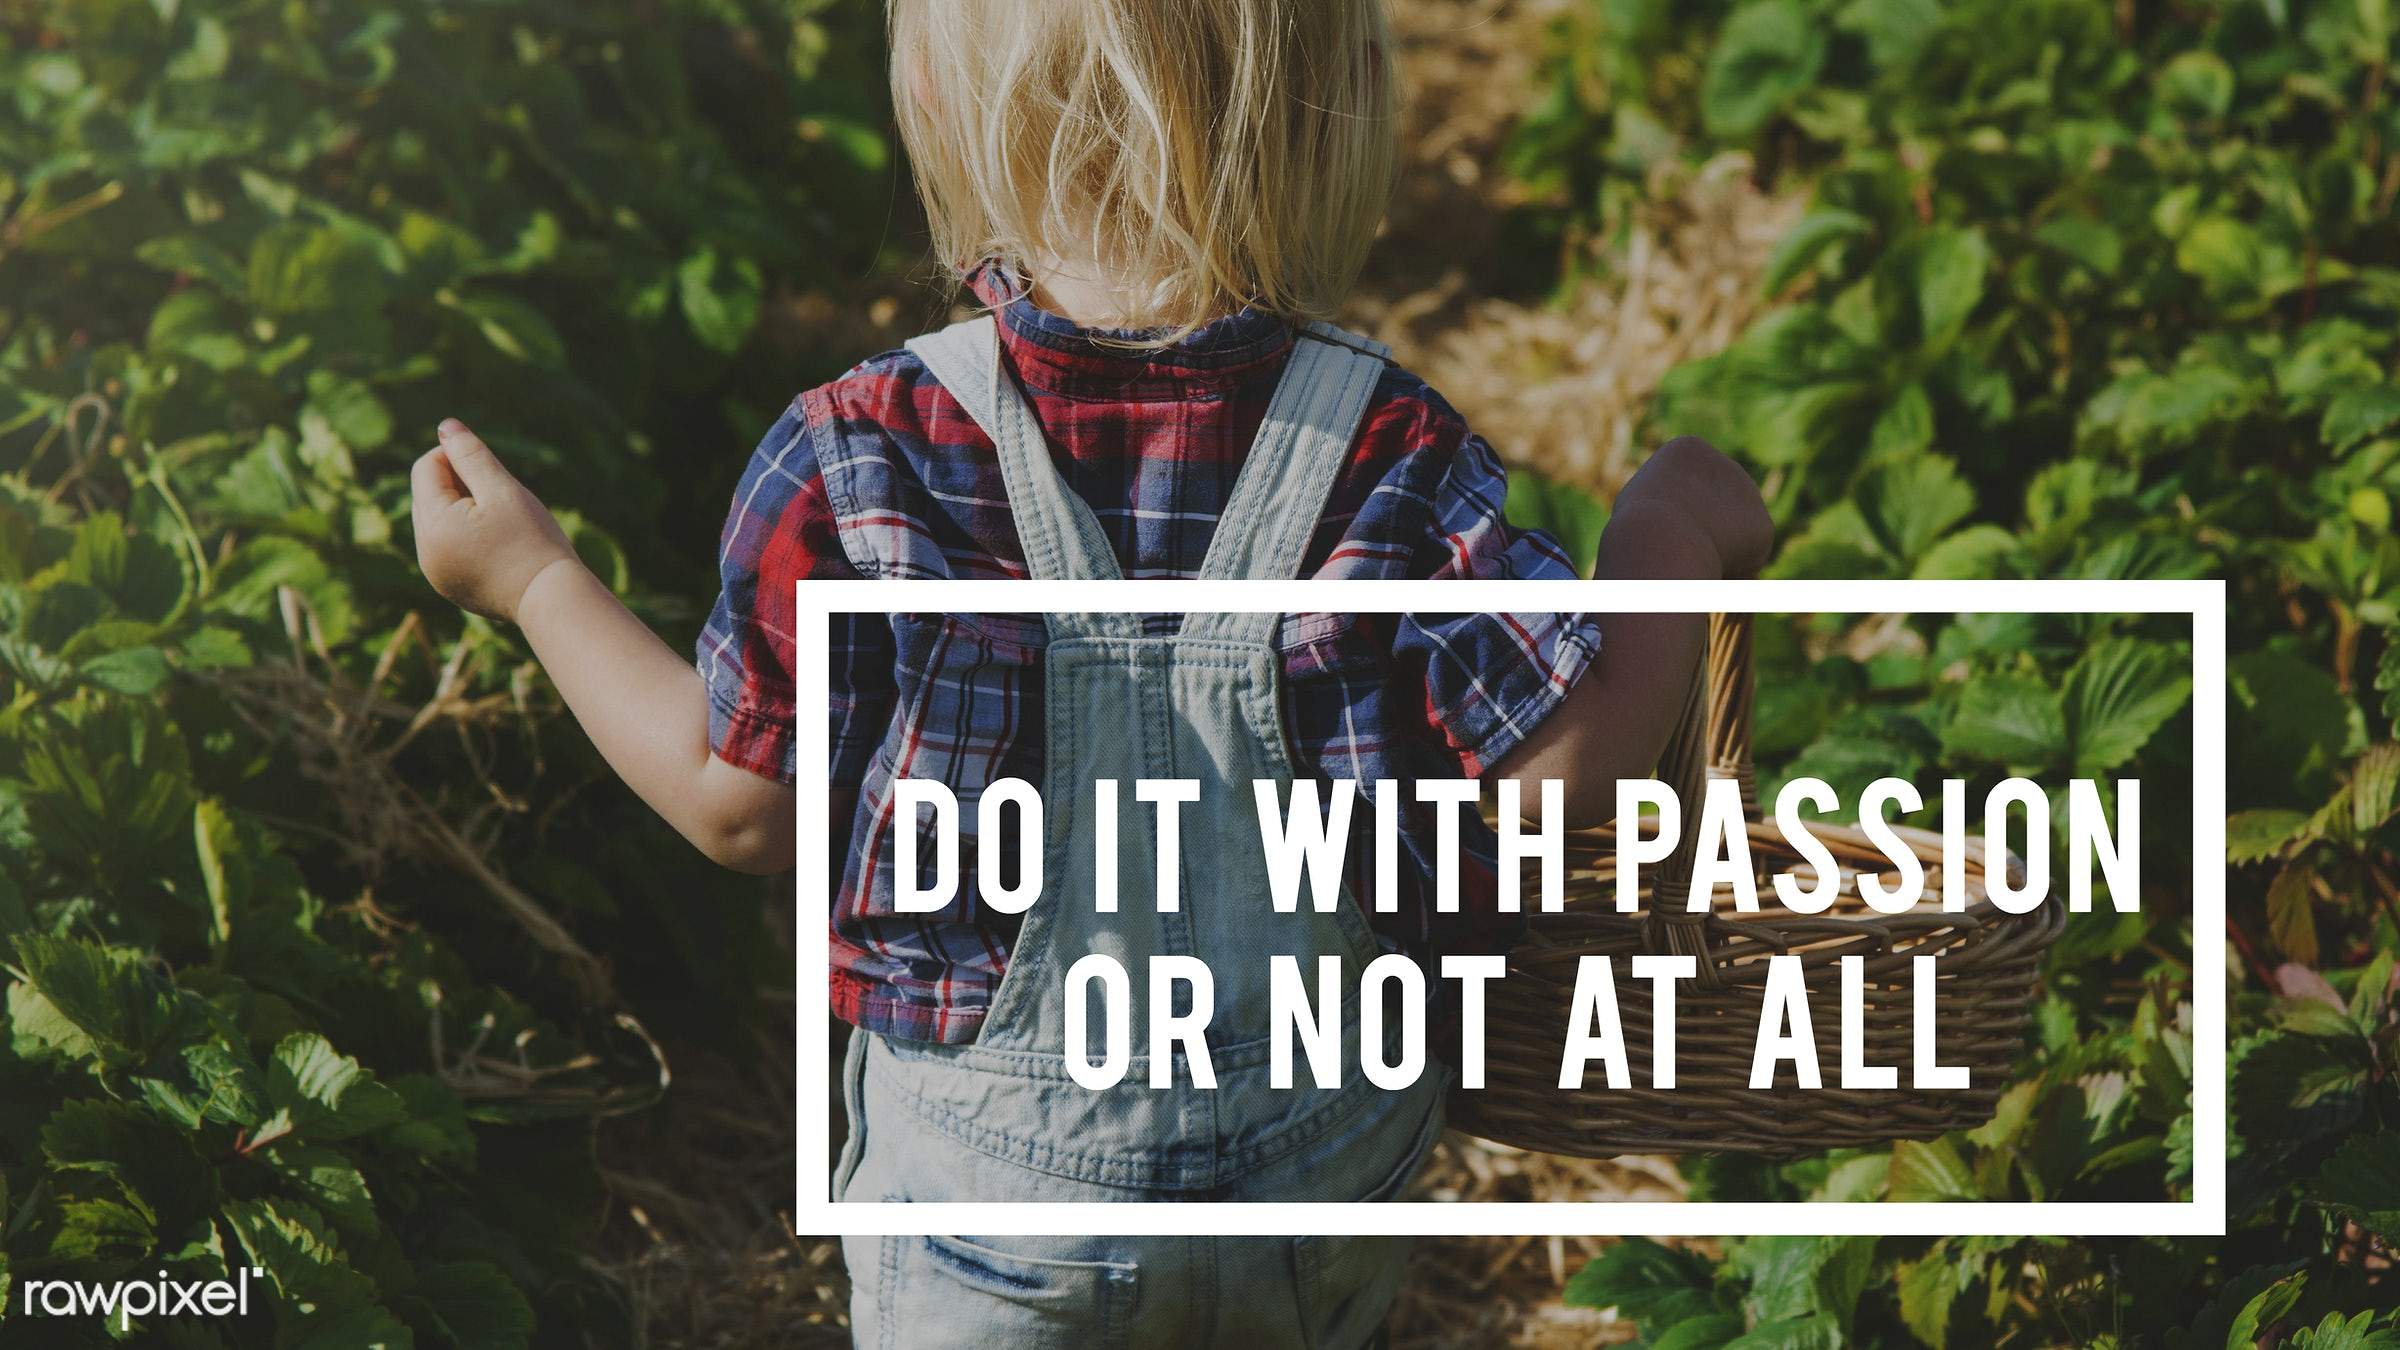 action, attitude, basket, blonde, boy, caucasian, change, dare, do it, dungarees, farm, freedom, fruit, fun, good, graphic,...